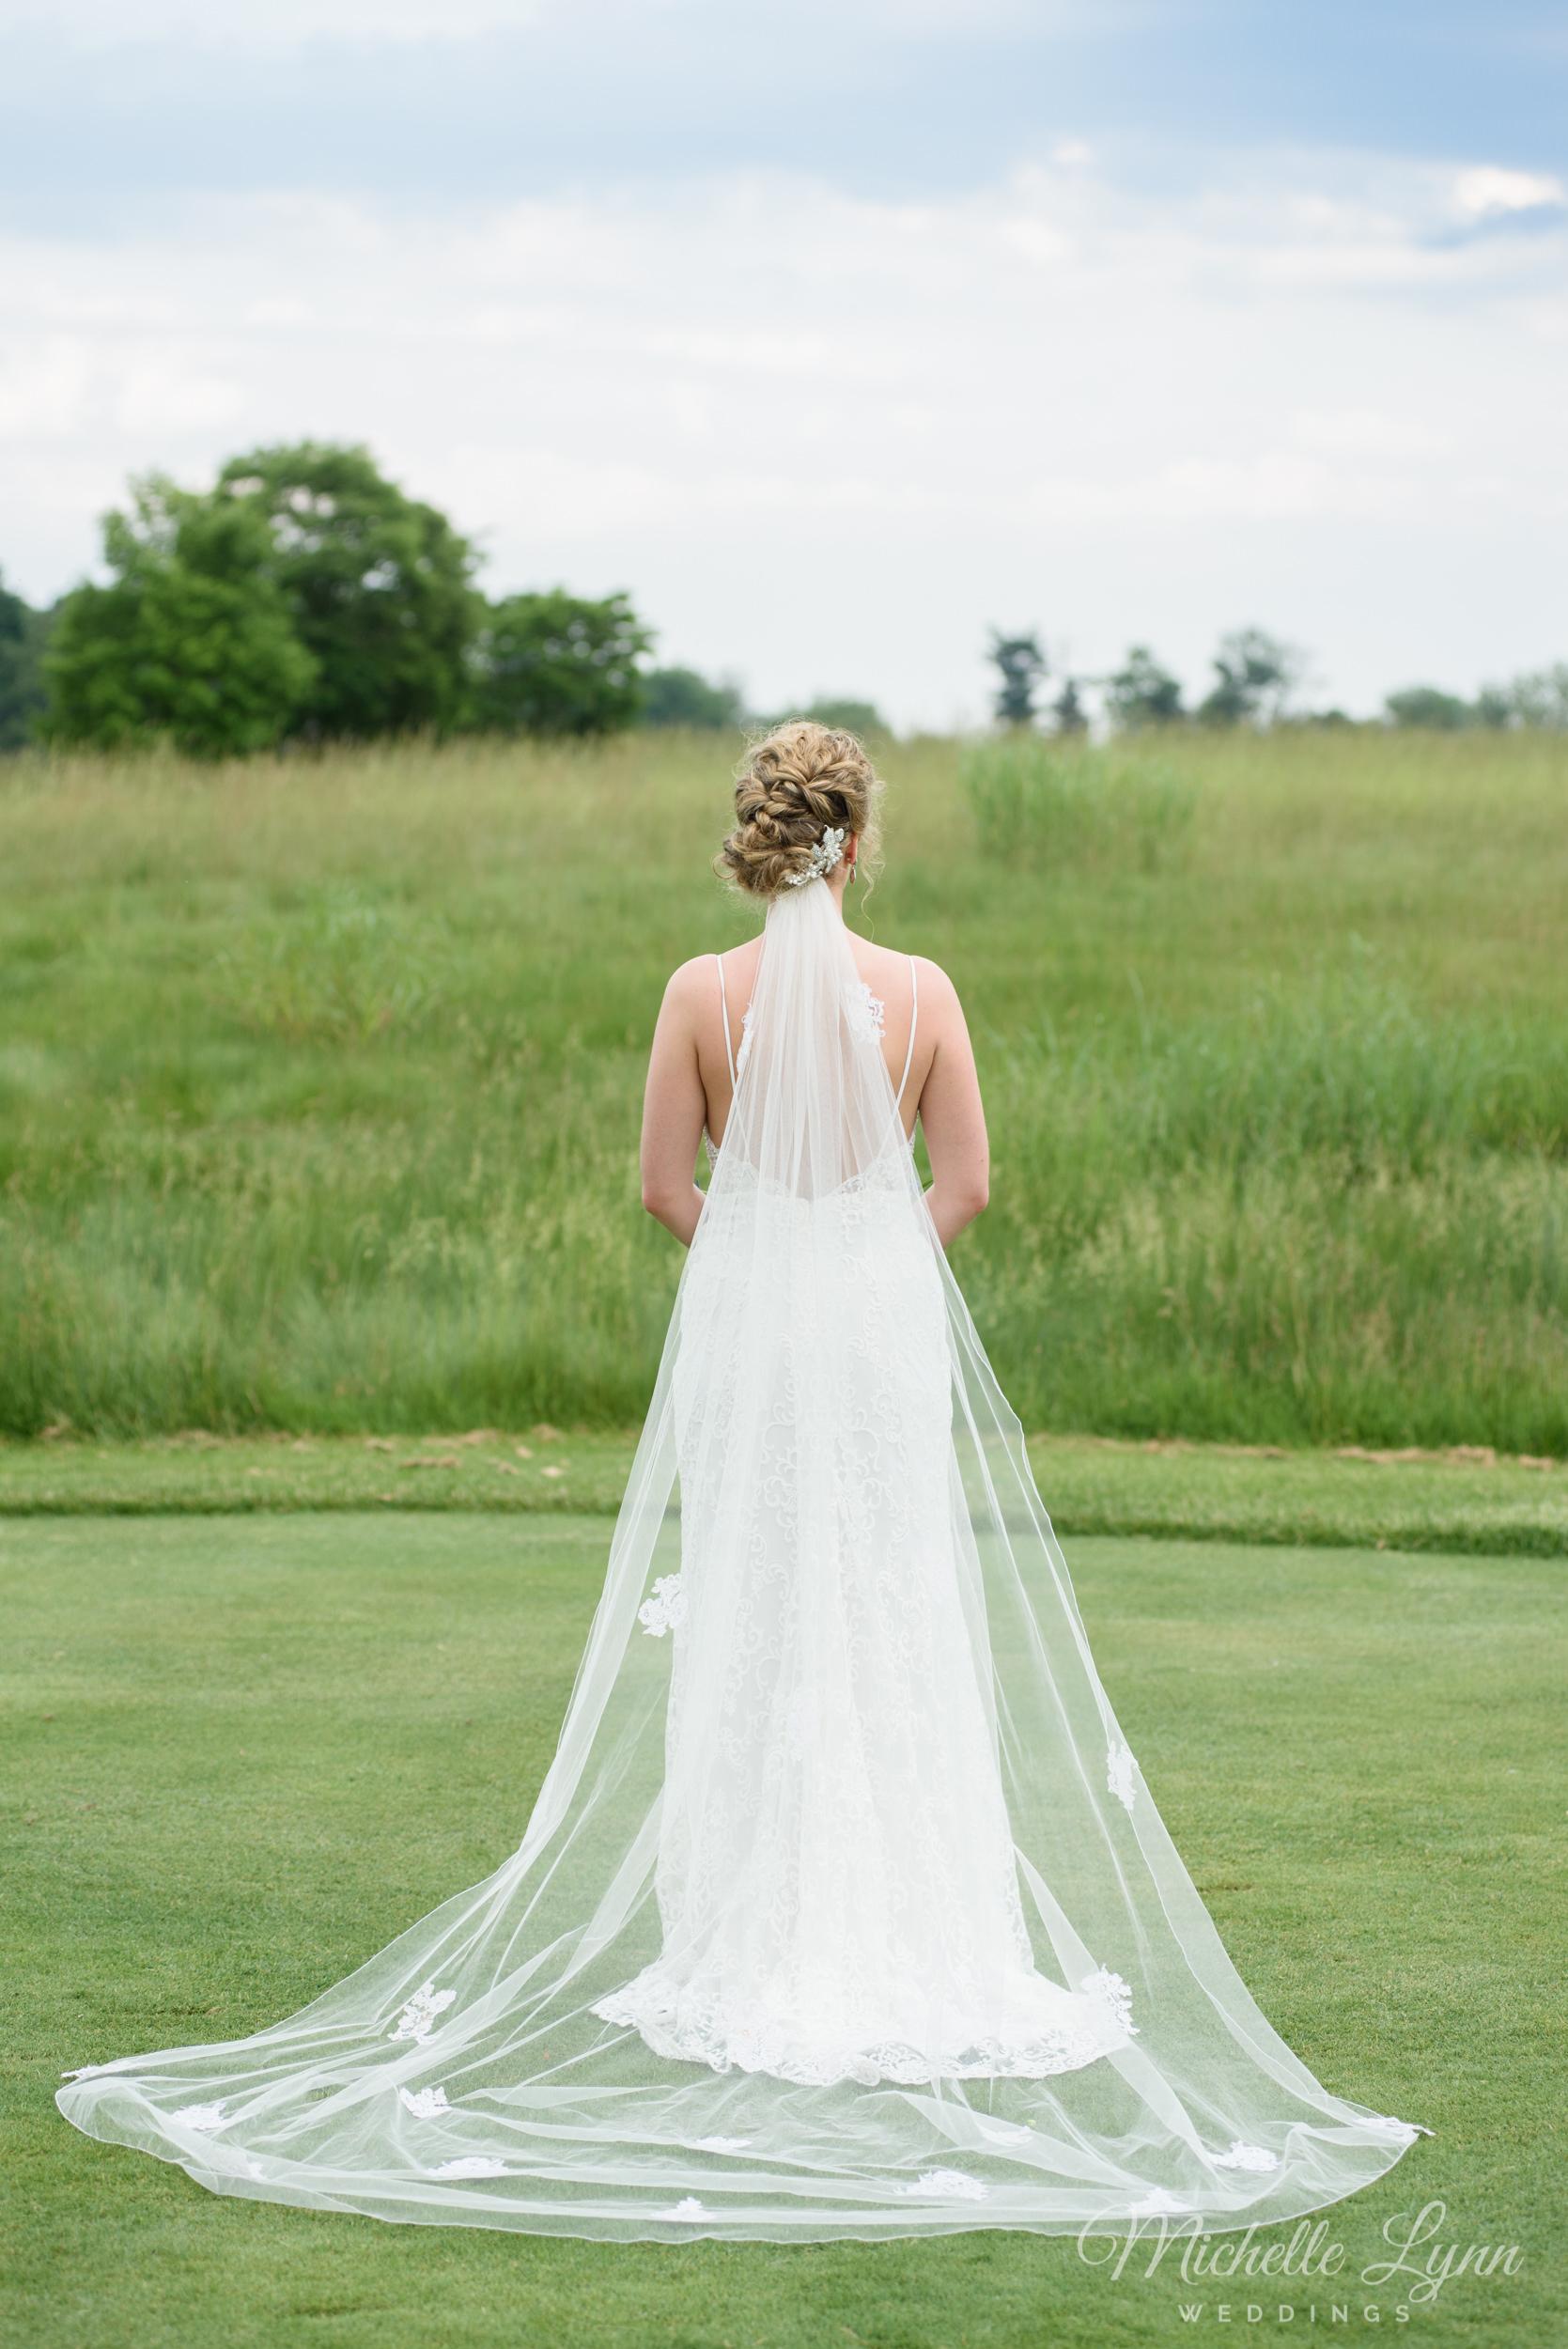 mlw-jericho-national-golf-club-wedding-photography-12.jpg